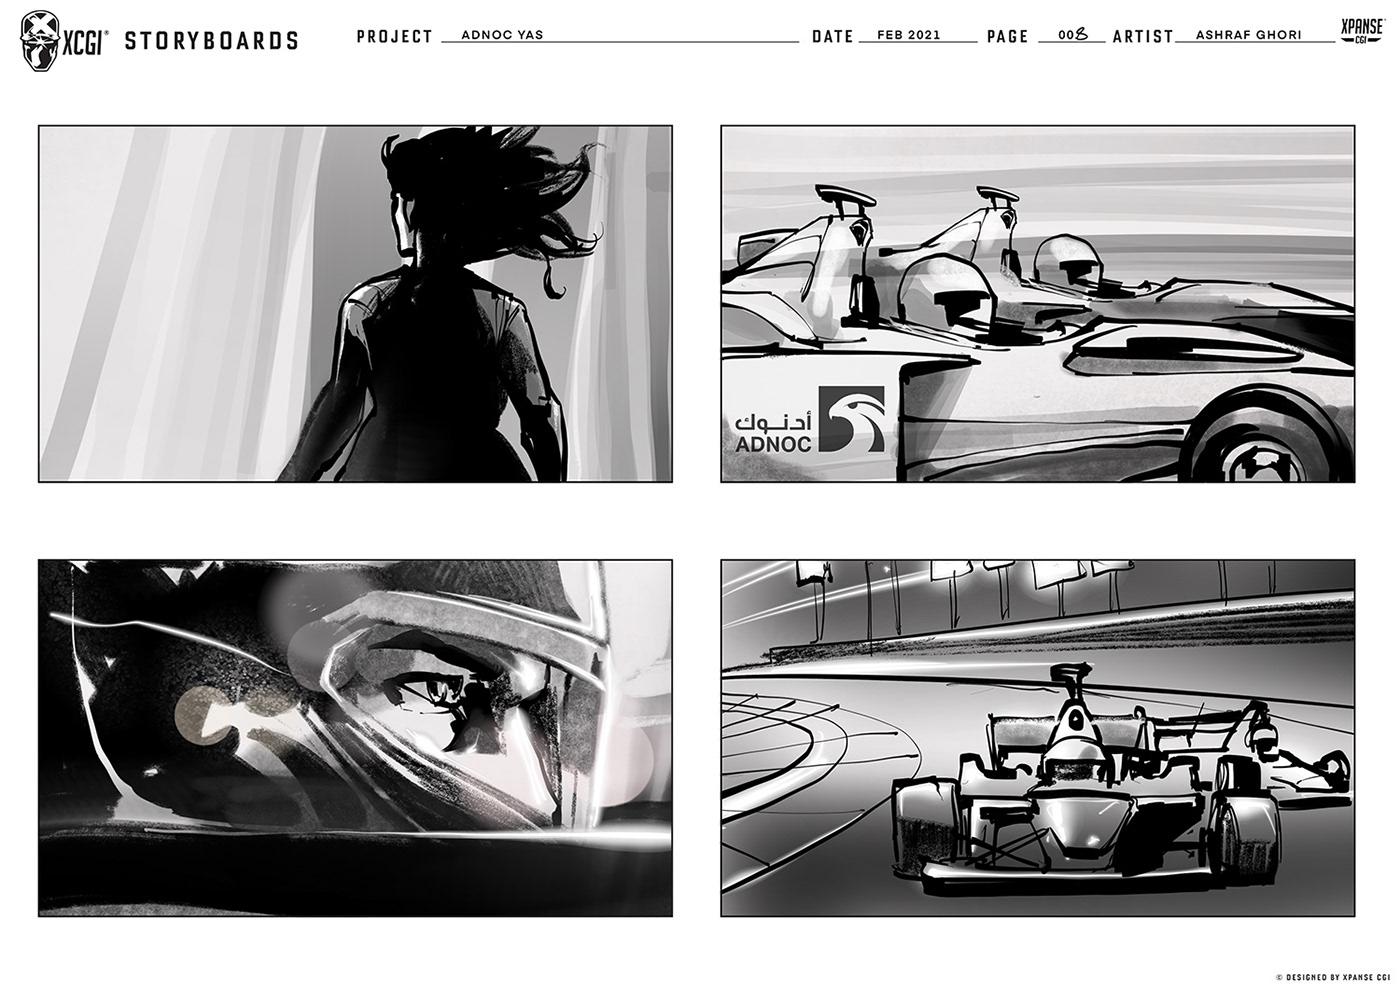 Abu Dhabi Adnoc f1 Formula 1 speed yas circuit YAS MARINA